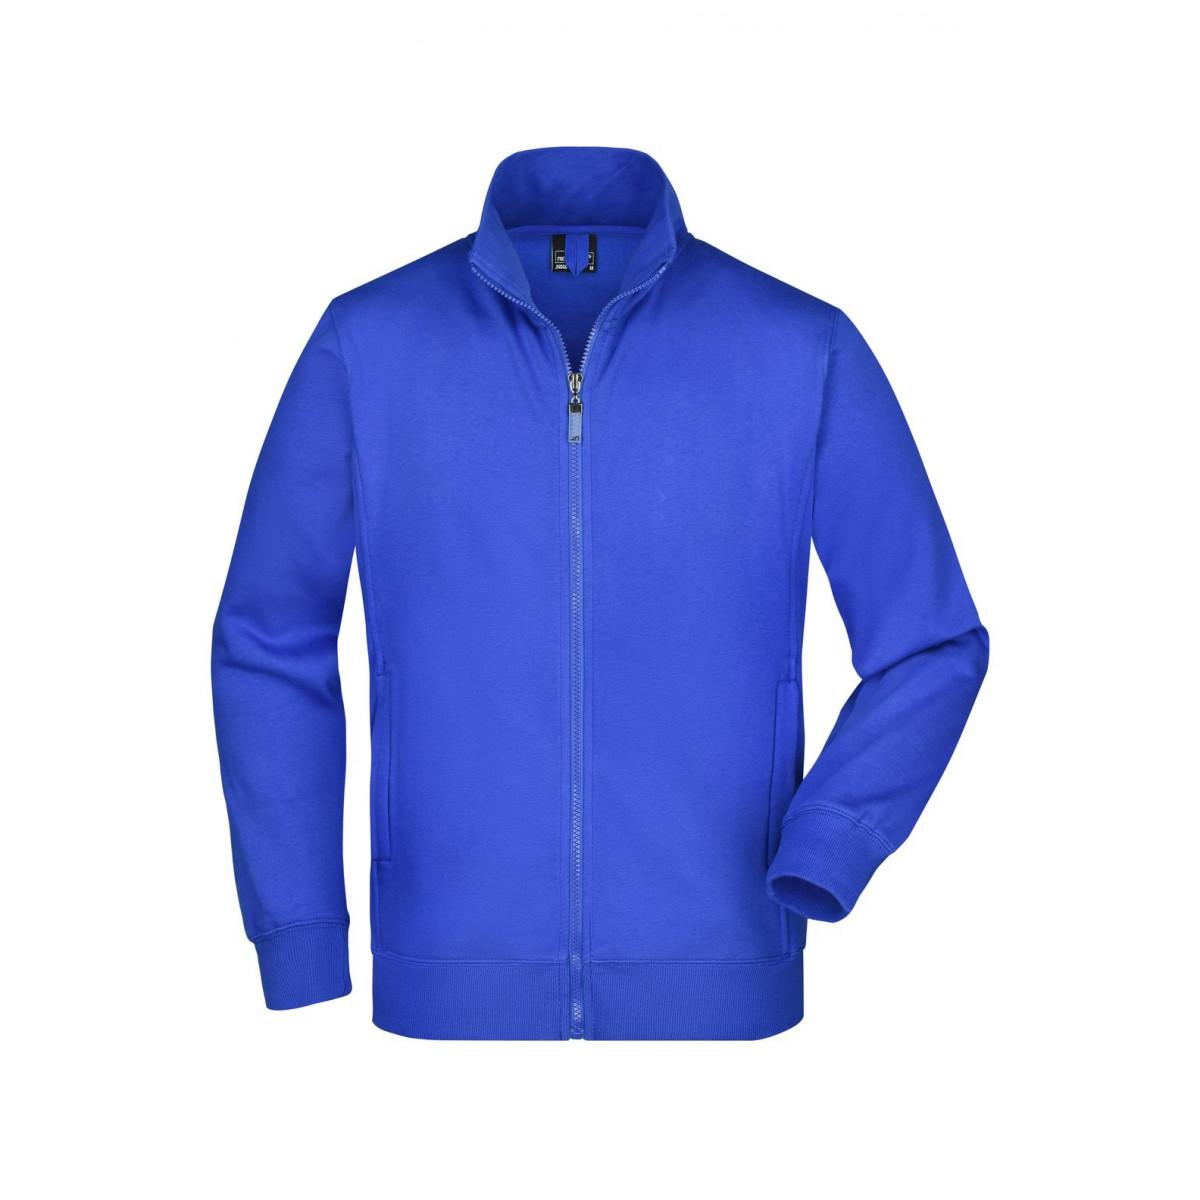 Толстовка мужская JN046 Mens Jacket - Ярко-синий